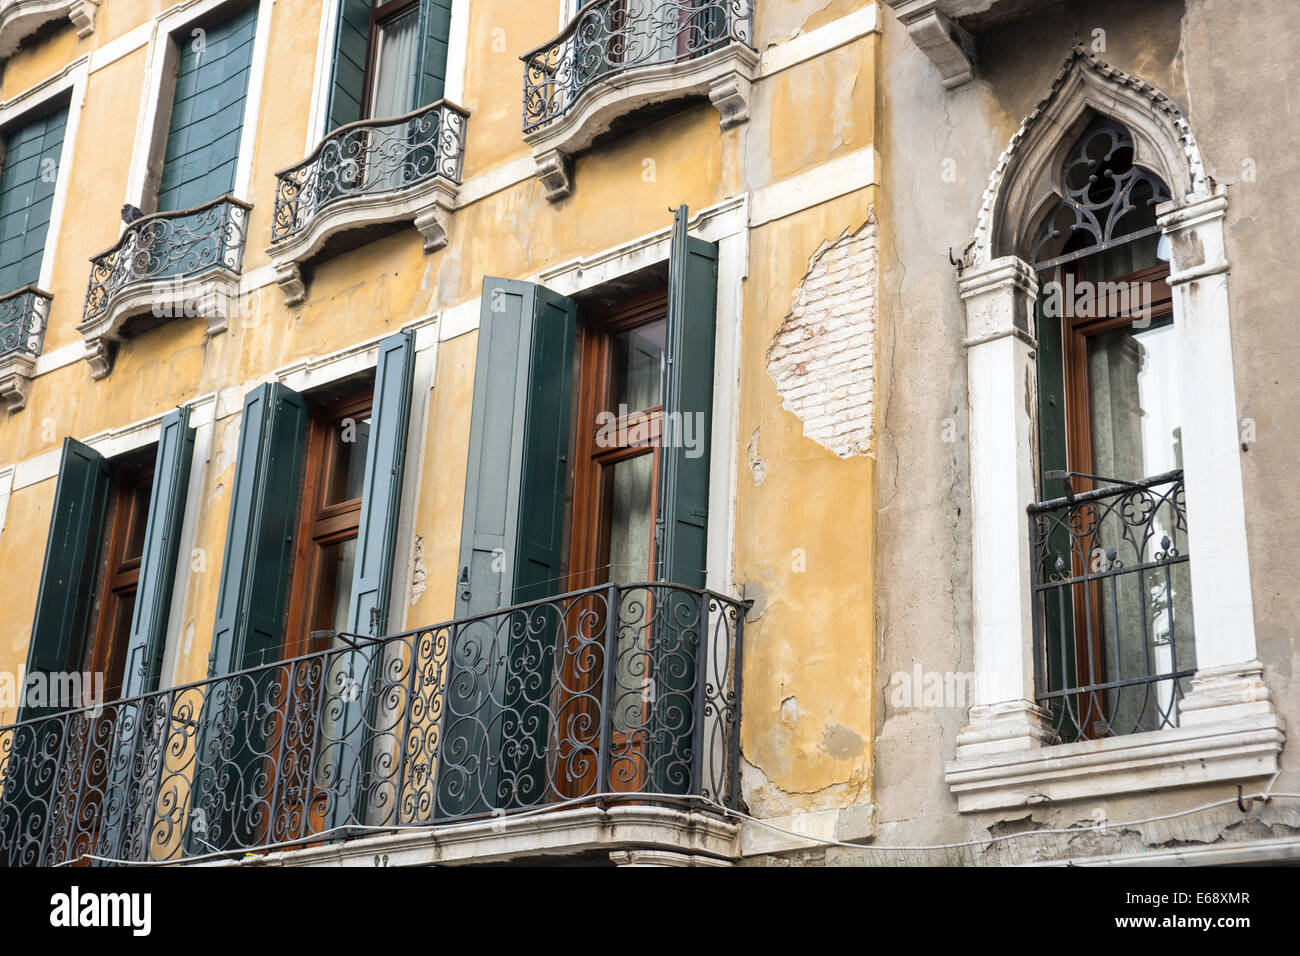 Detail of upper floor of old house with balcony french doors detail of upper floor of old house with balcony french doors green shutters and pealing plaster rubansaba